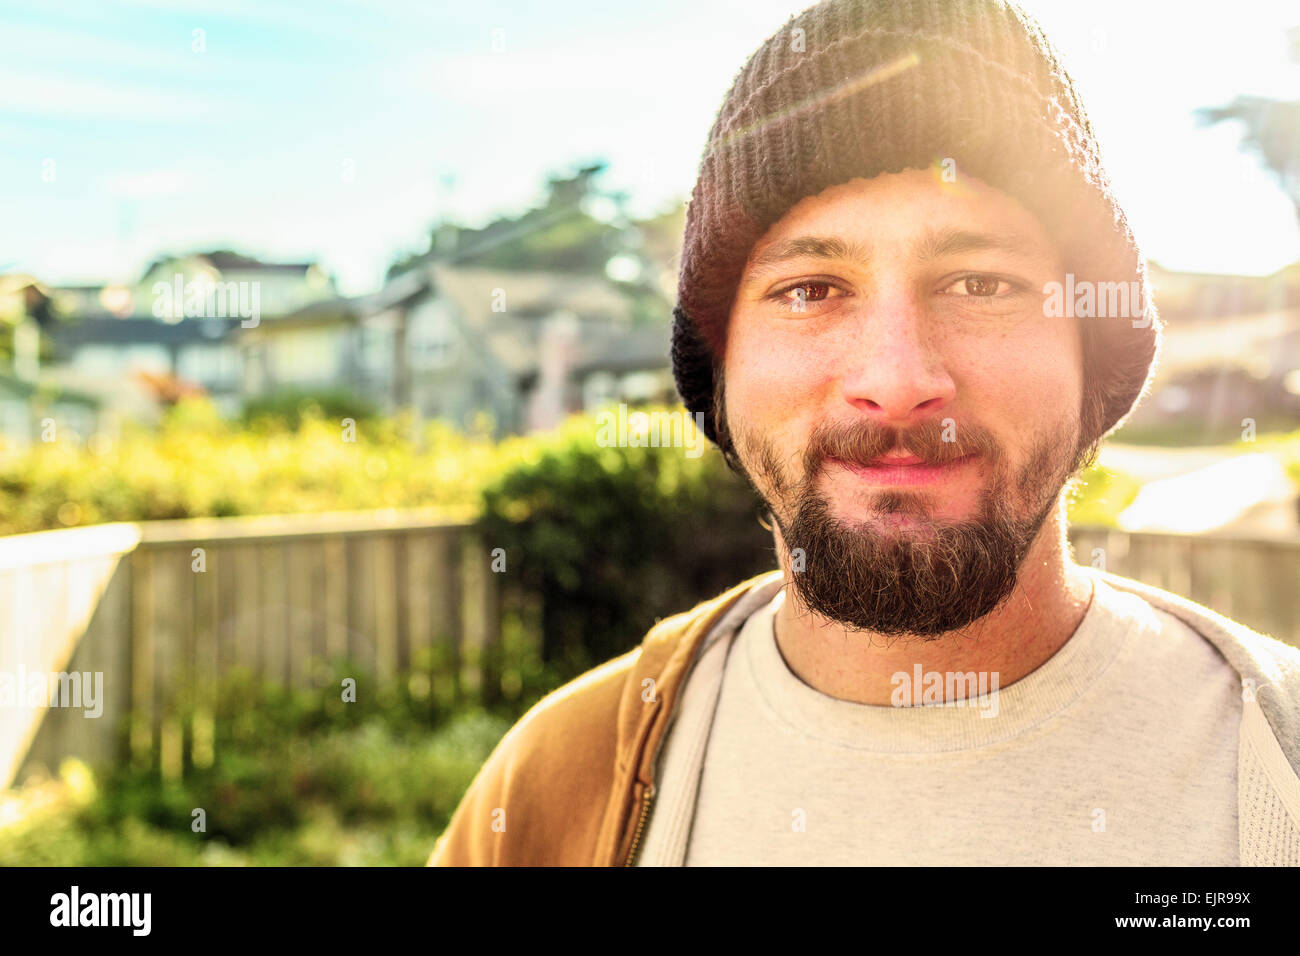 Caucasian man smiling in backyard Stock Photo